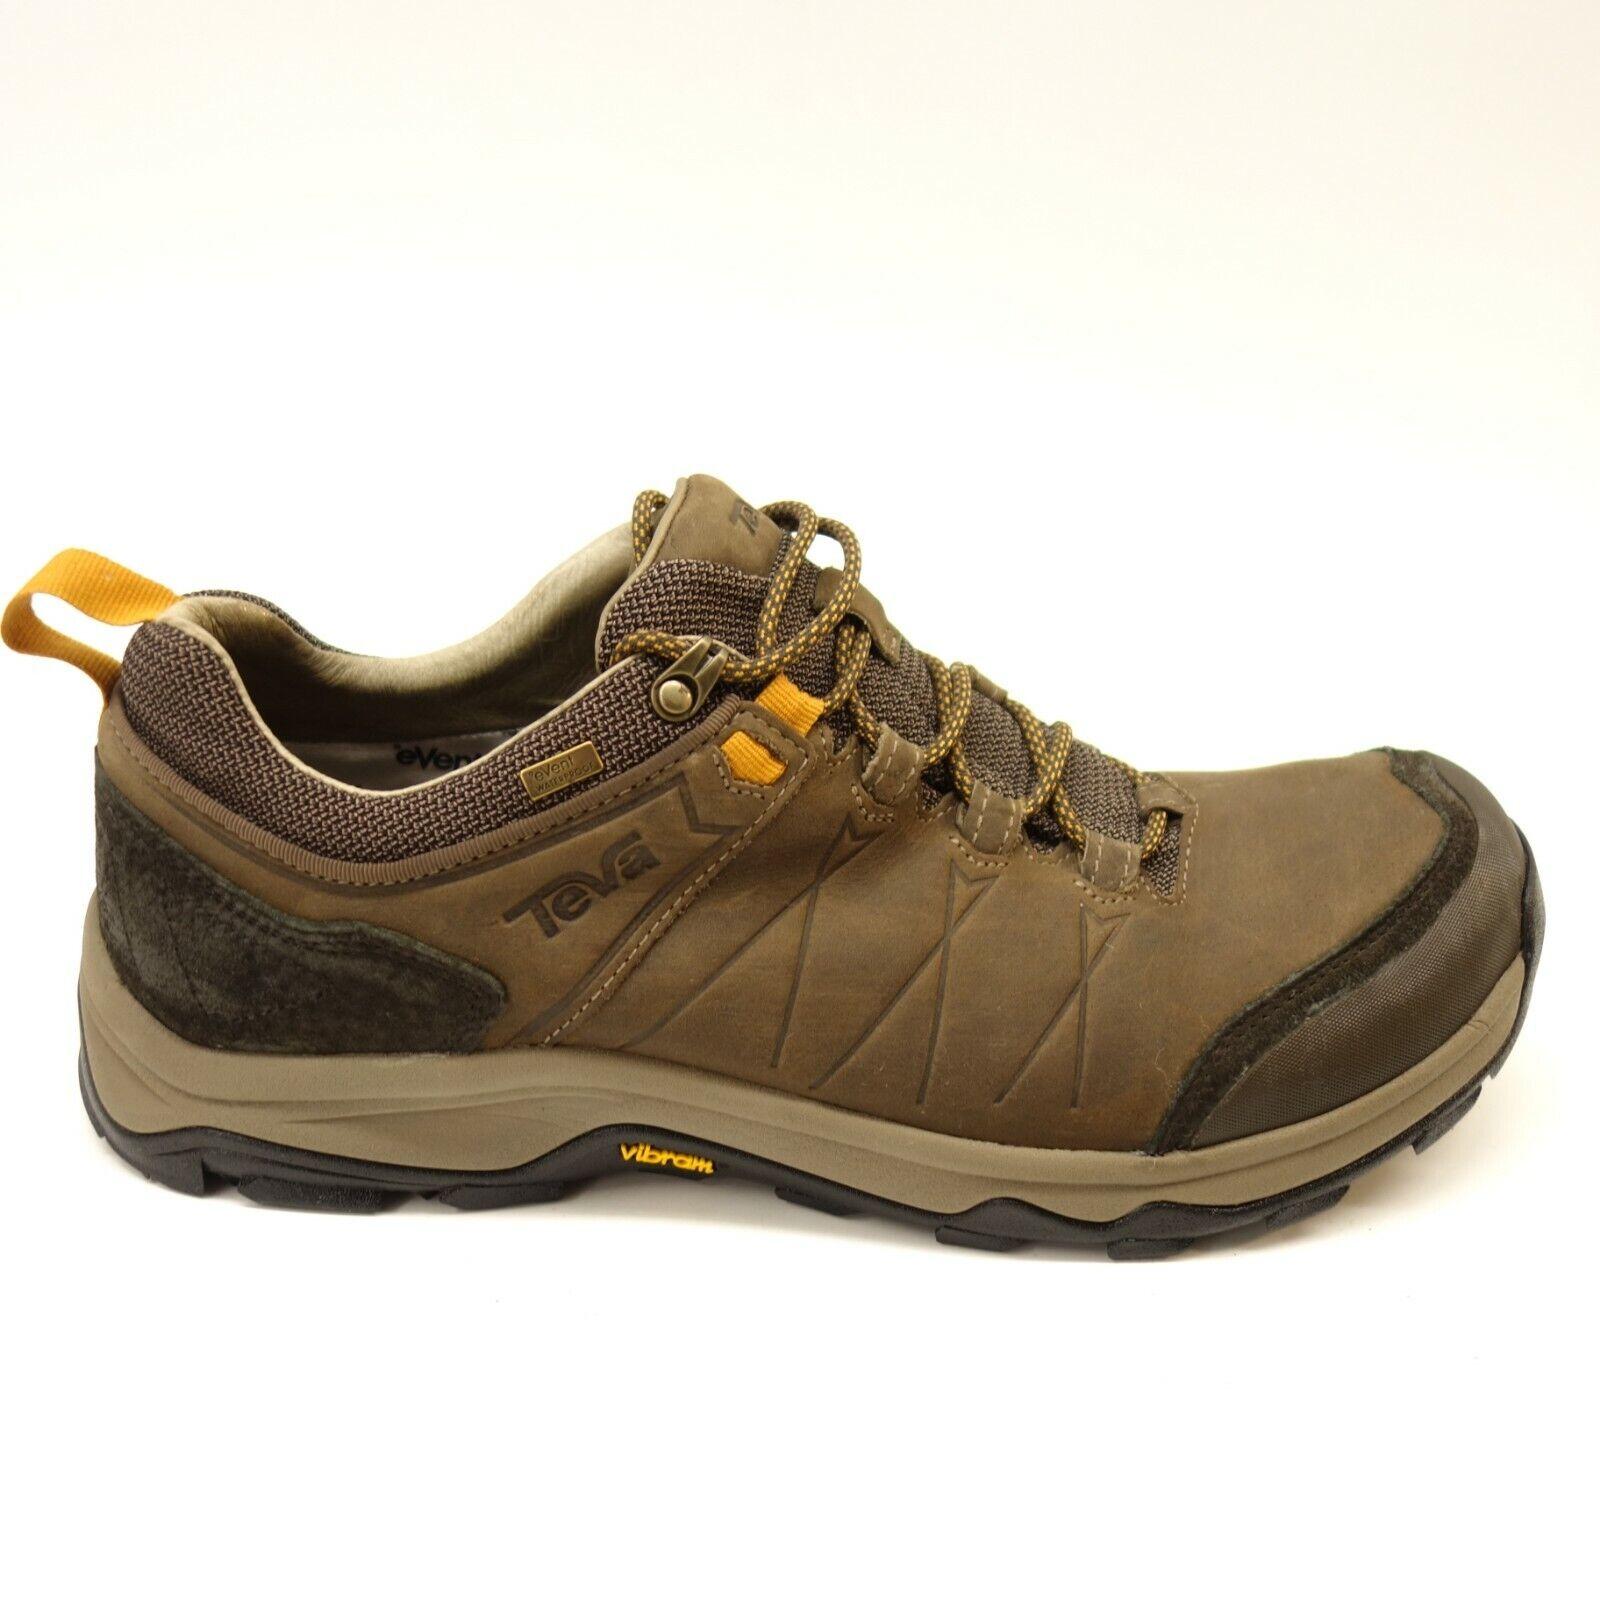 Teva Riva Event a prueba de agua para hombre Arrowood Athletic Senderismo Trail Zapatos